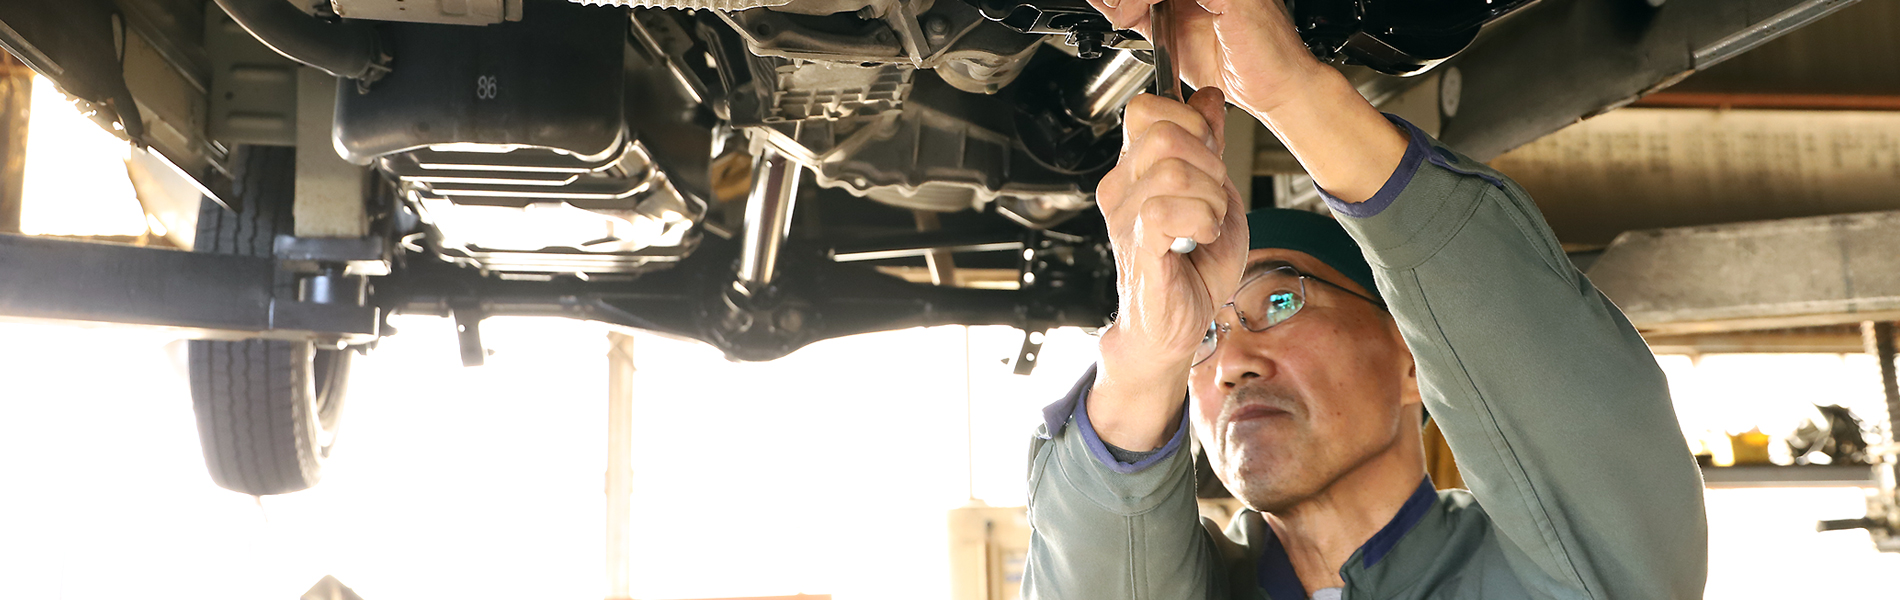 美濃加茂市の渡辺モータース車検整備・板金塗装